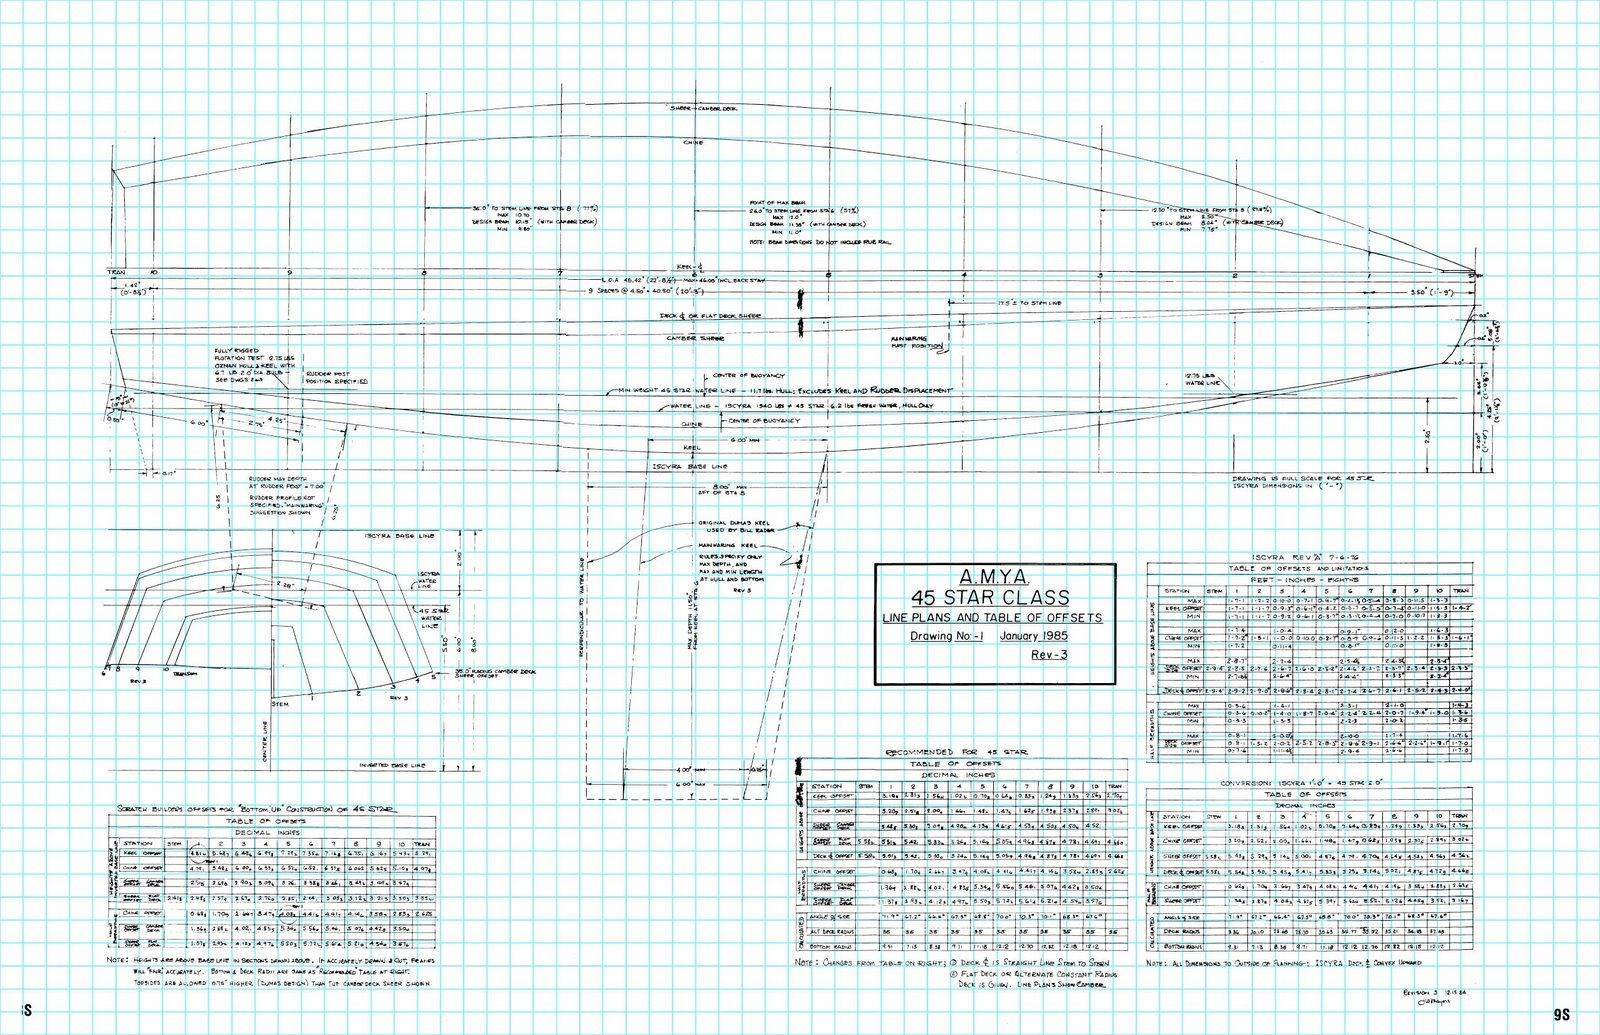 sunair boat builders inc essay Read and download sunair boat builders case study answers free ebooks in pdf format - 60 sirah sahabat rasulullah saw physics june 10th 2014 mark scheme how to.